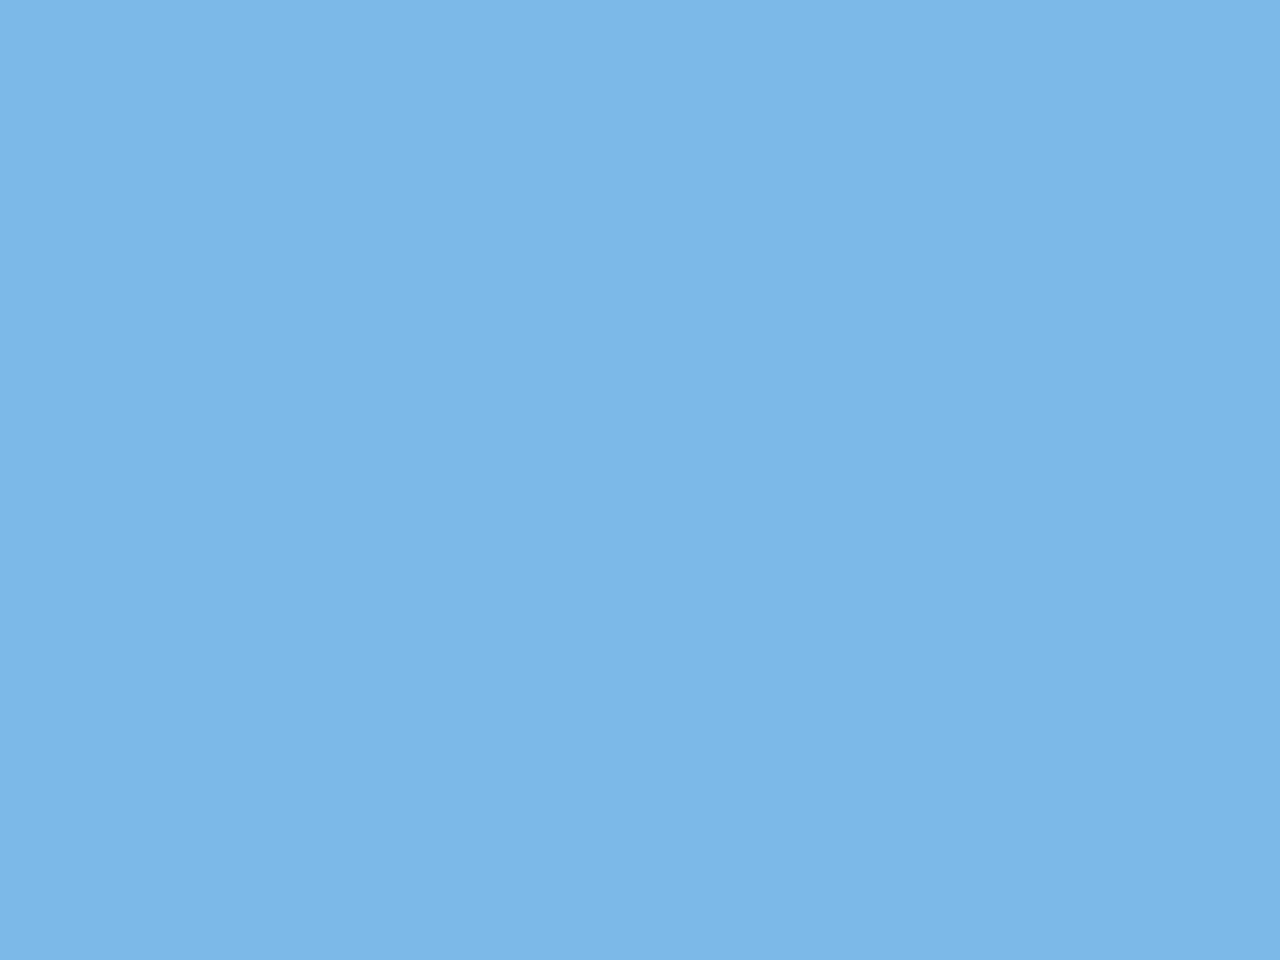 1280x960 Aero Solid Color Background